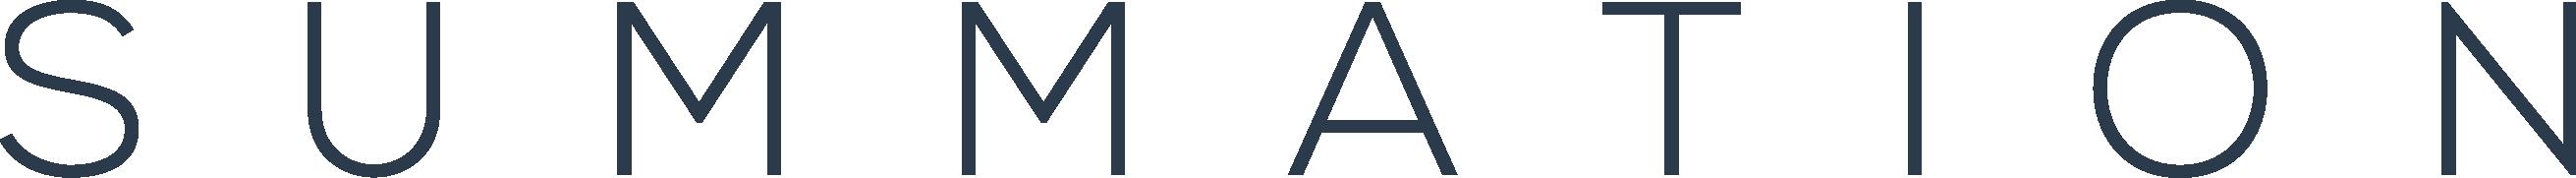 Summation_logo.png